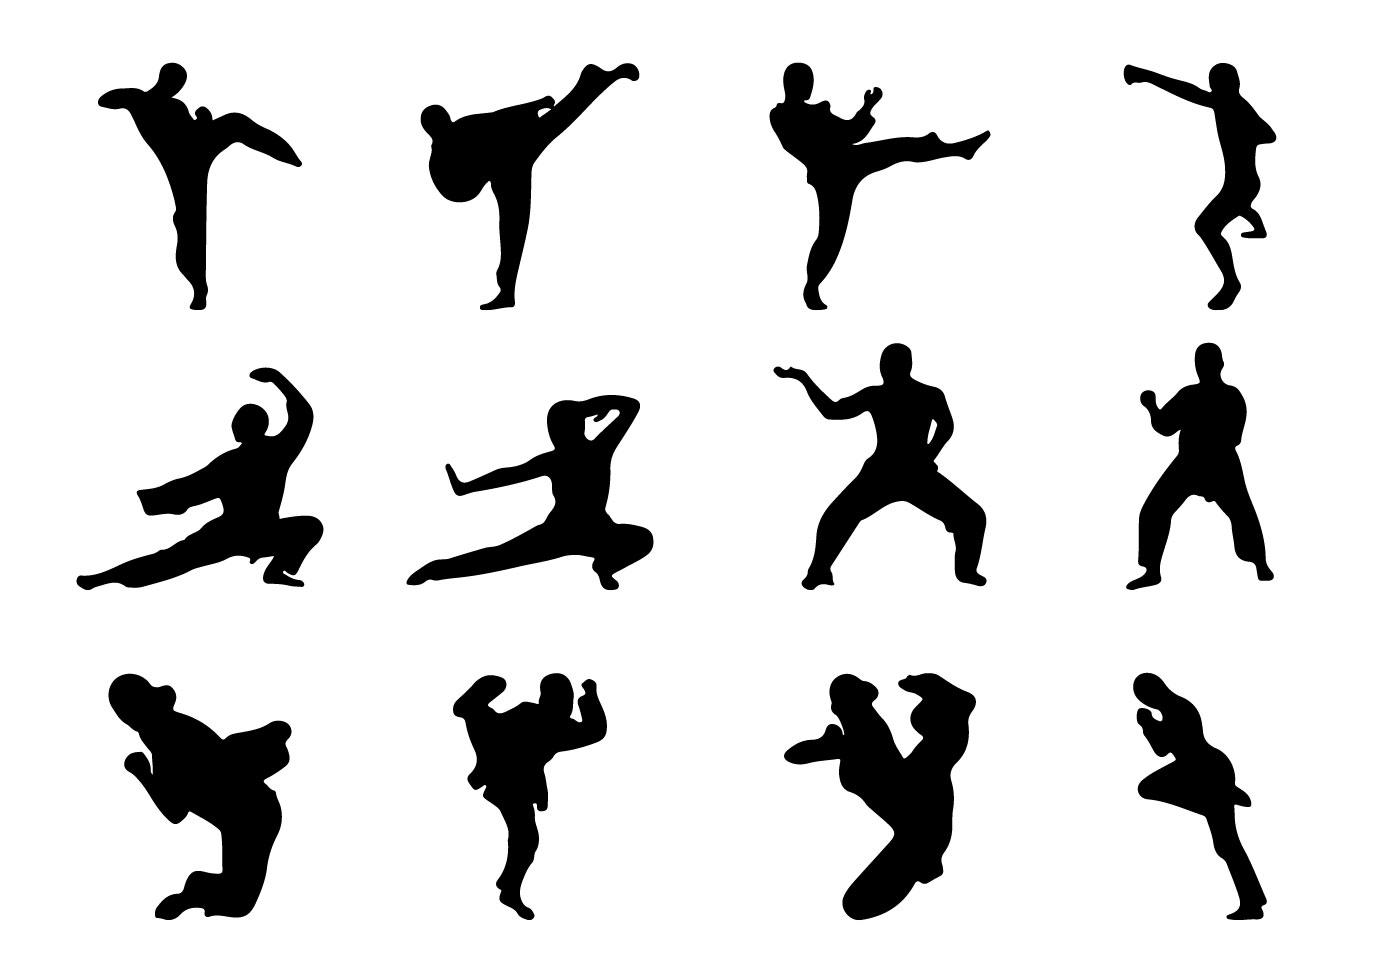 Martial Arts Silhouette Vector - Download Free Vectors, Clipart ...